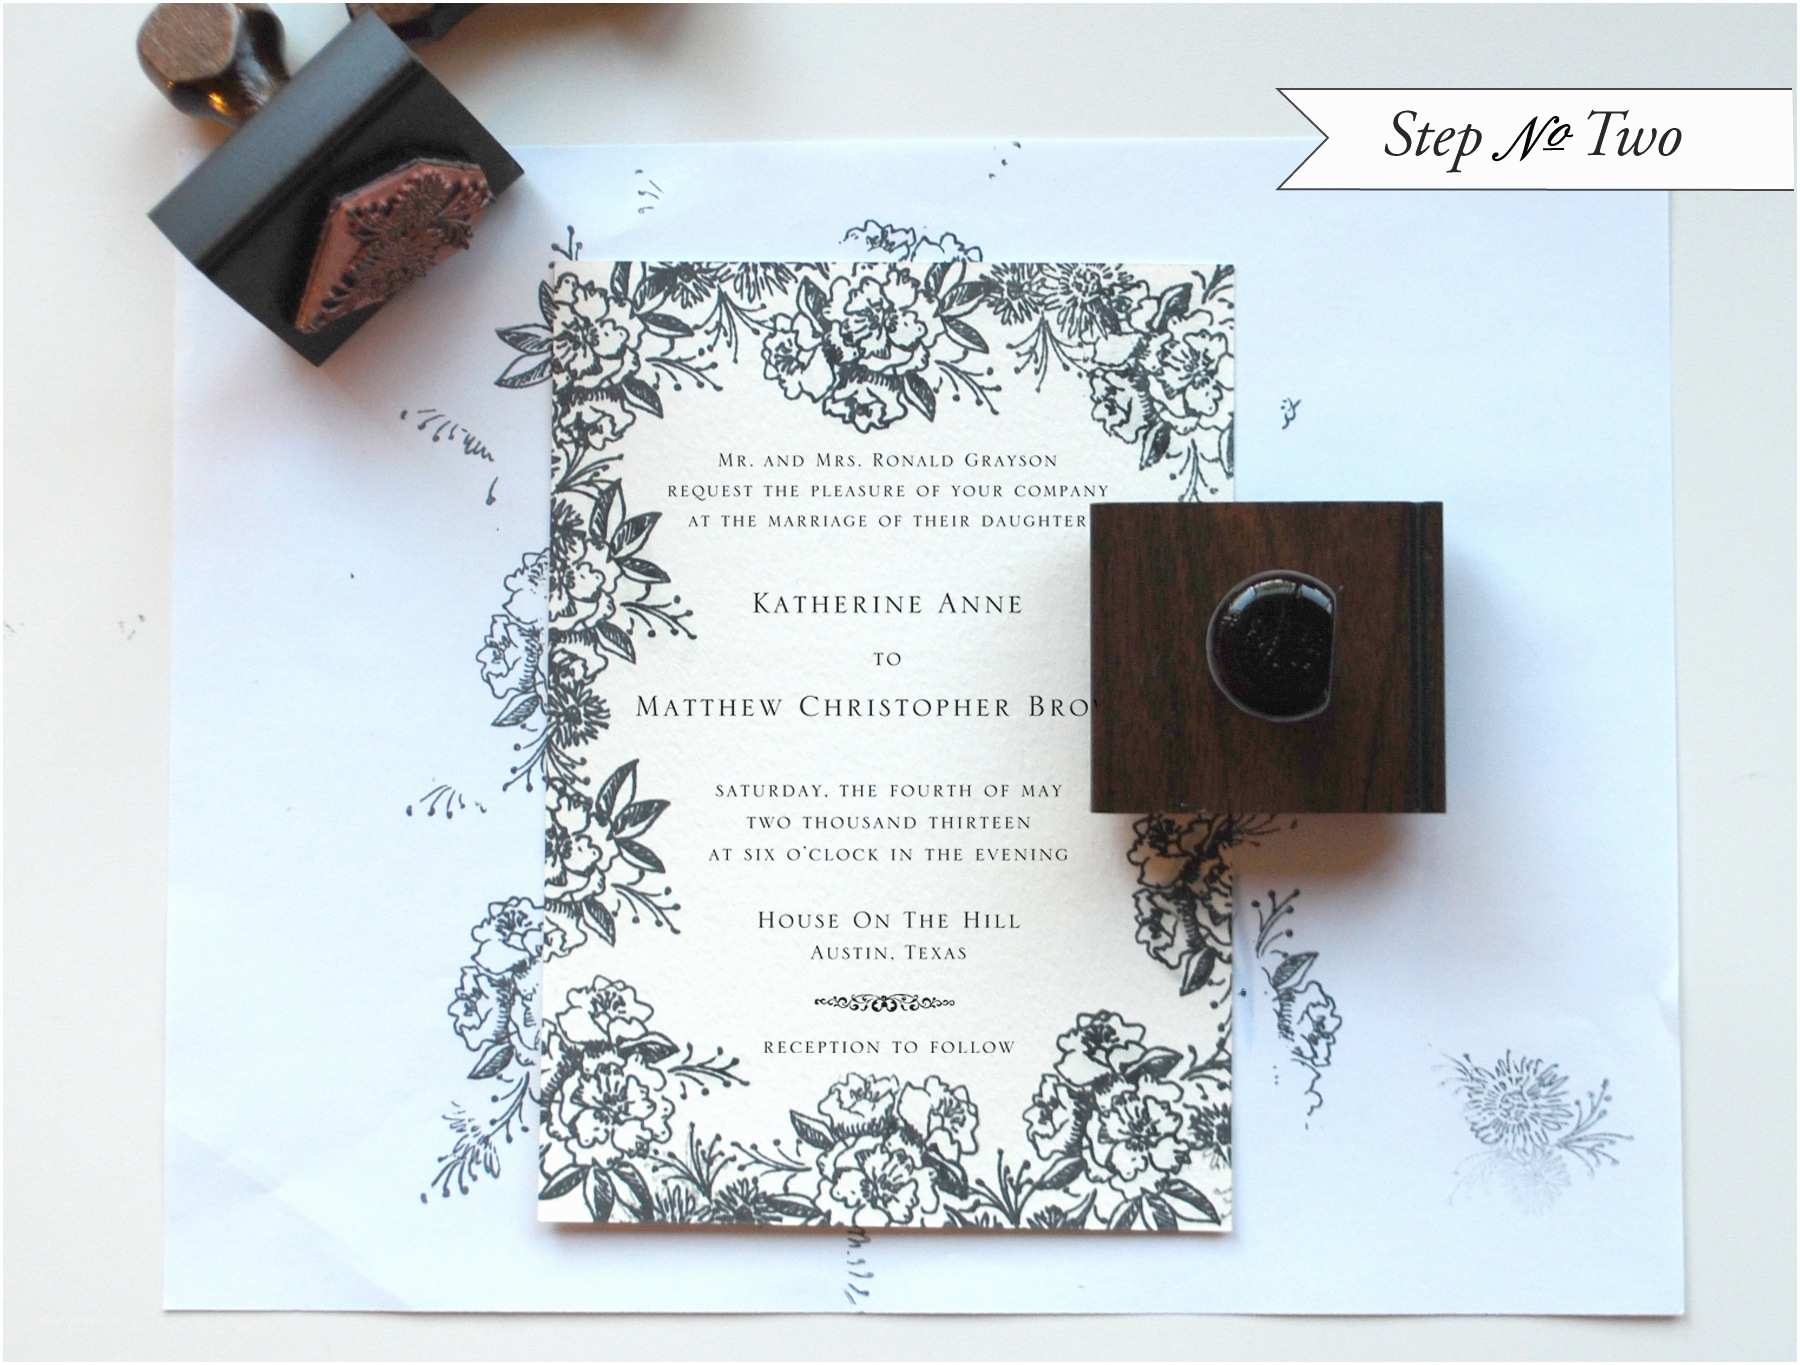 Make Your Own Wedding Invitations Ideas Design Your Own Wedding Invitations Line